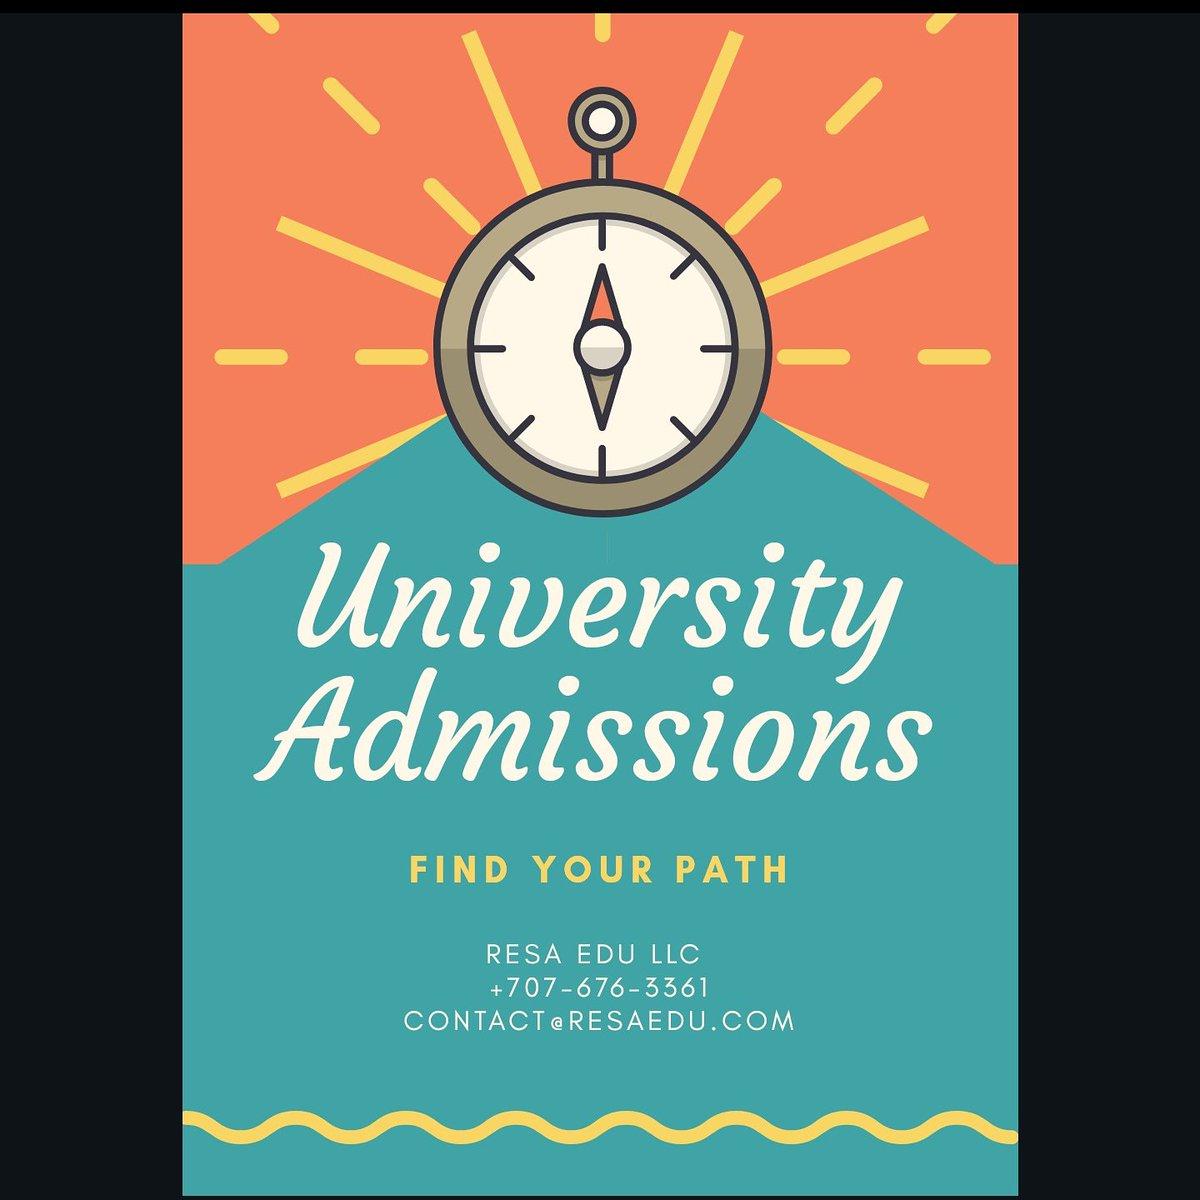 Offering 95% acceptance rate into our #partnered #univerisities  #scholarships  Contact US now!   #studyabroad #studyinUK #Studyvisa #studyinCanada #studyinUSA #ksa #saudi #arabia #iran #bahrain #qatar #morocco #egypt #kuwait #tunis #oman #bachelors #masters #phd #admissions